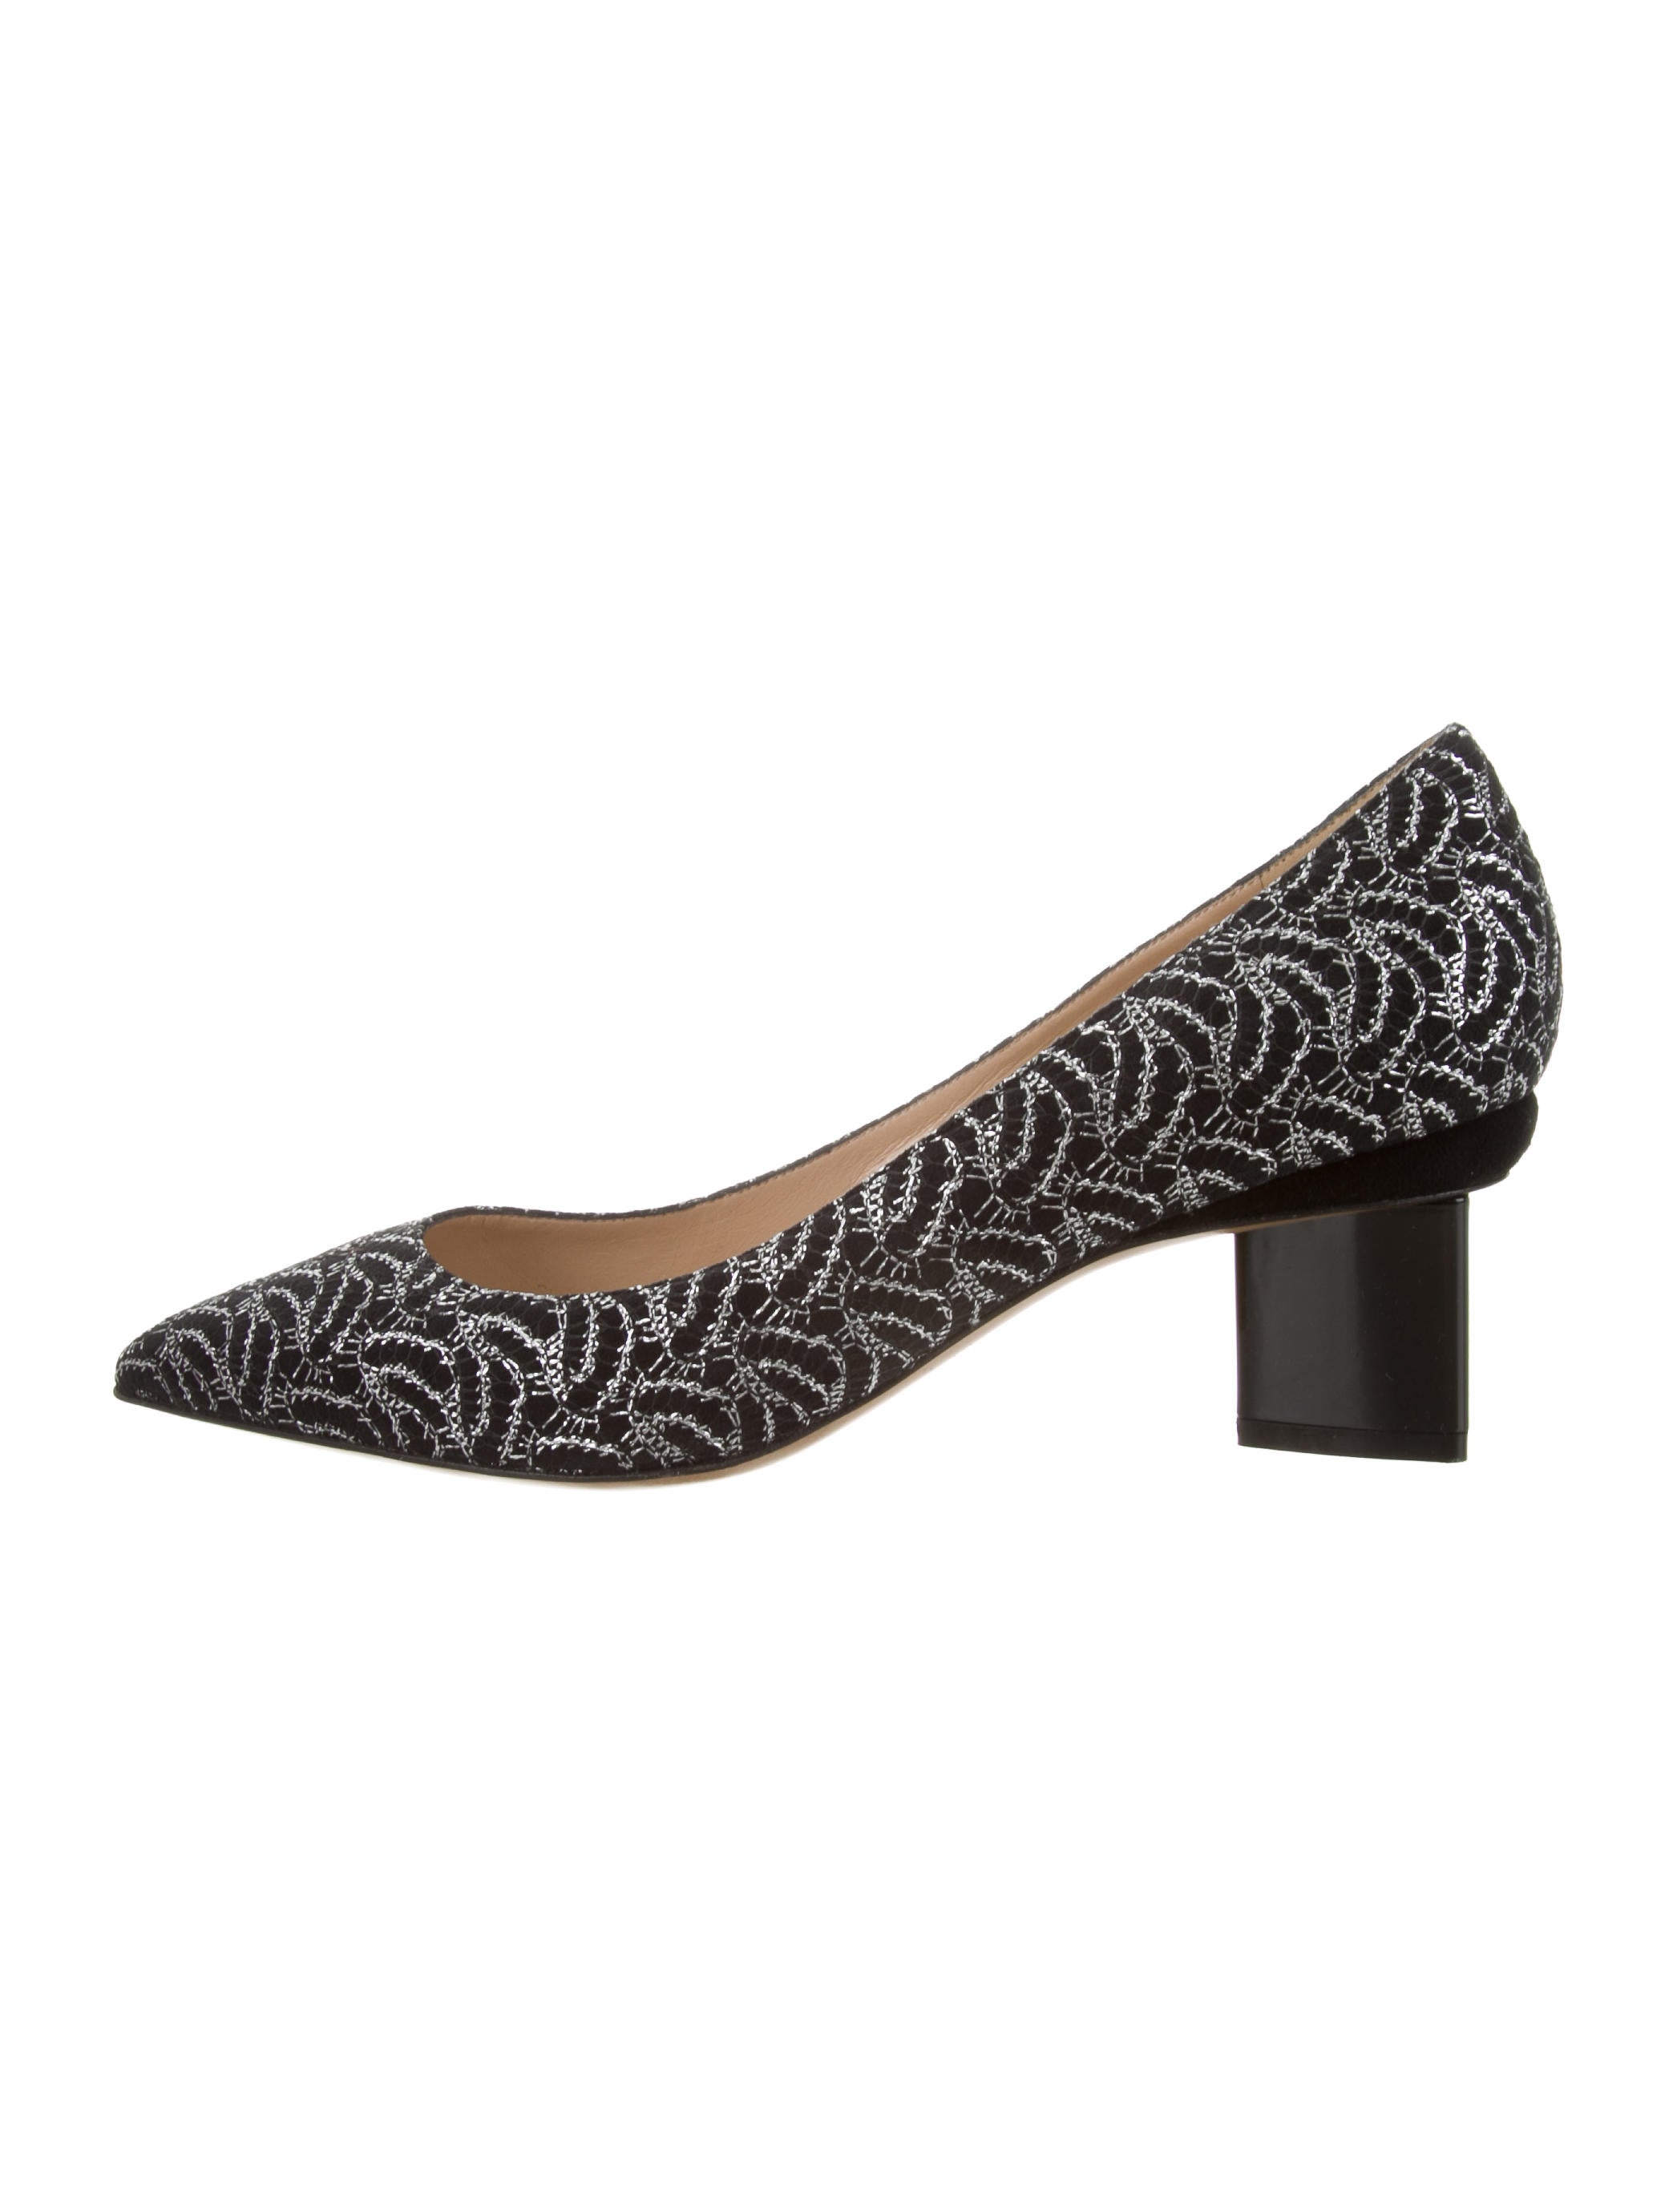 cheapest price sale online Nicholas Kirkwood Woven Pointed-Toe Pumps footlocker pictures online h9kyR7nj